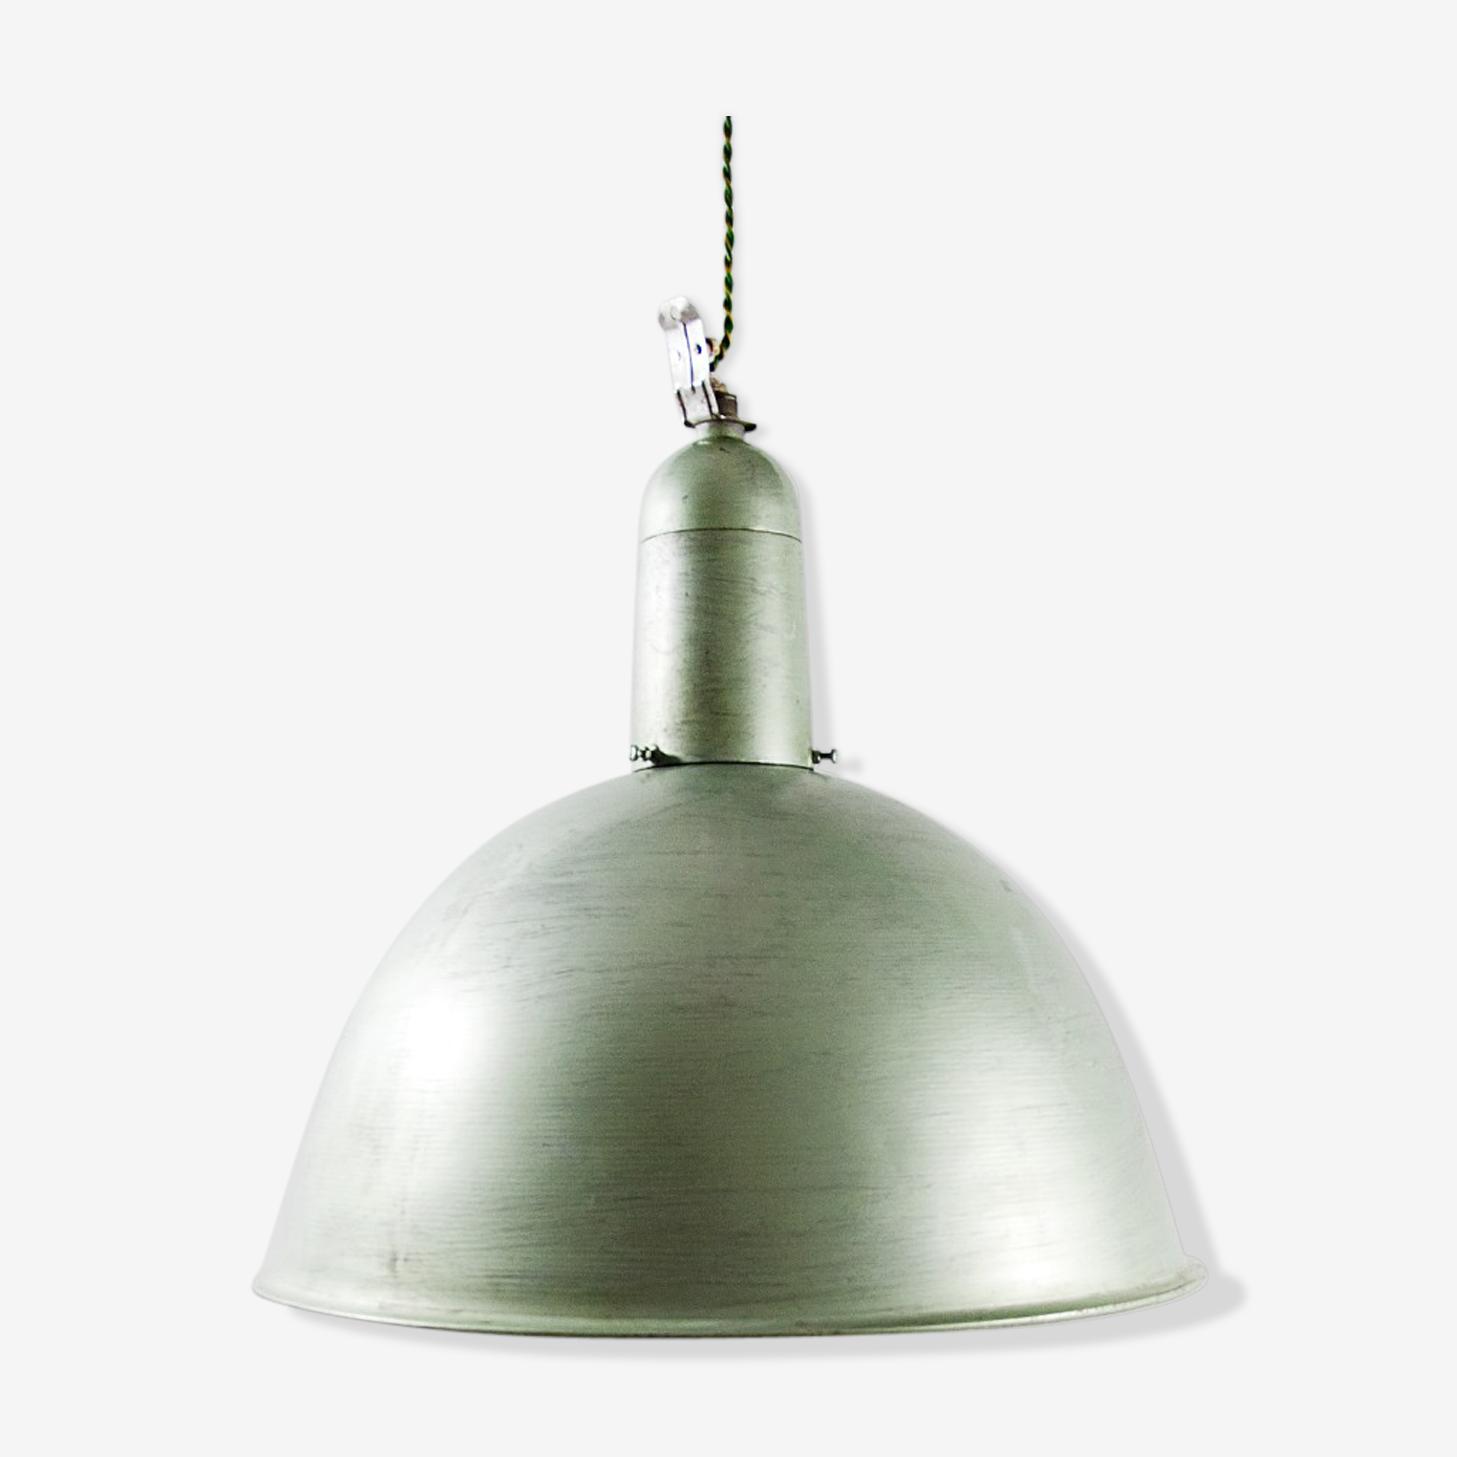 The Norwegian brand Glamox 70s industrial lamp